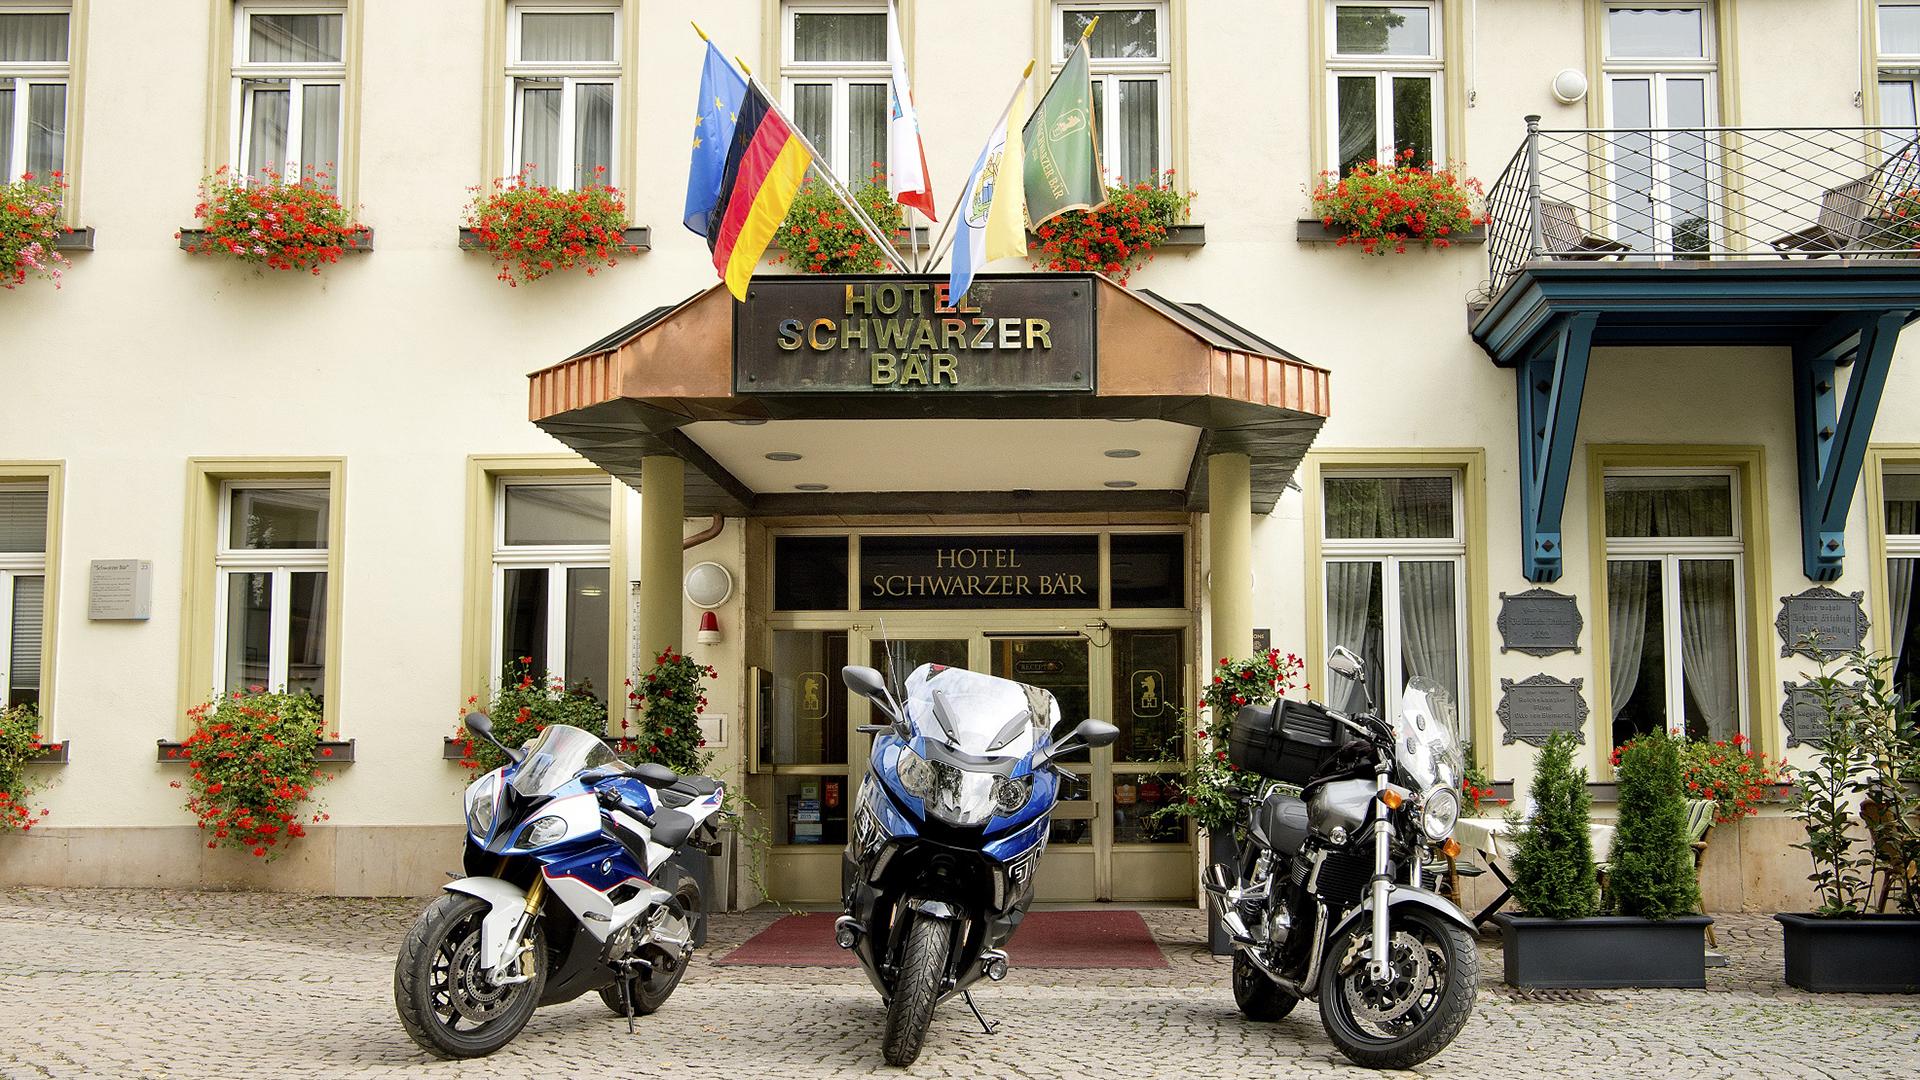 Hotel Schwarzer Bär Jena OHG